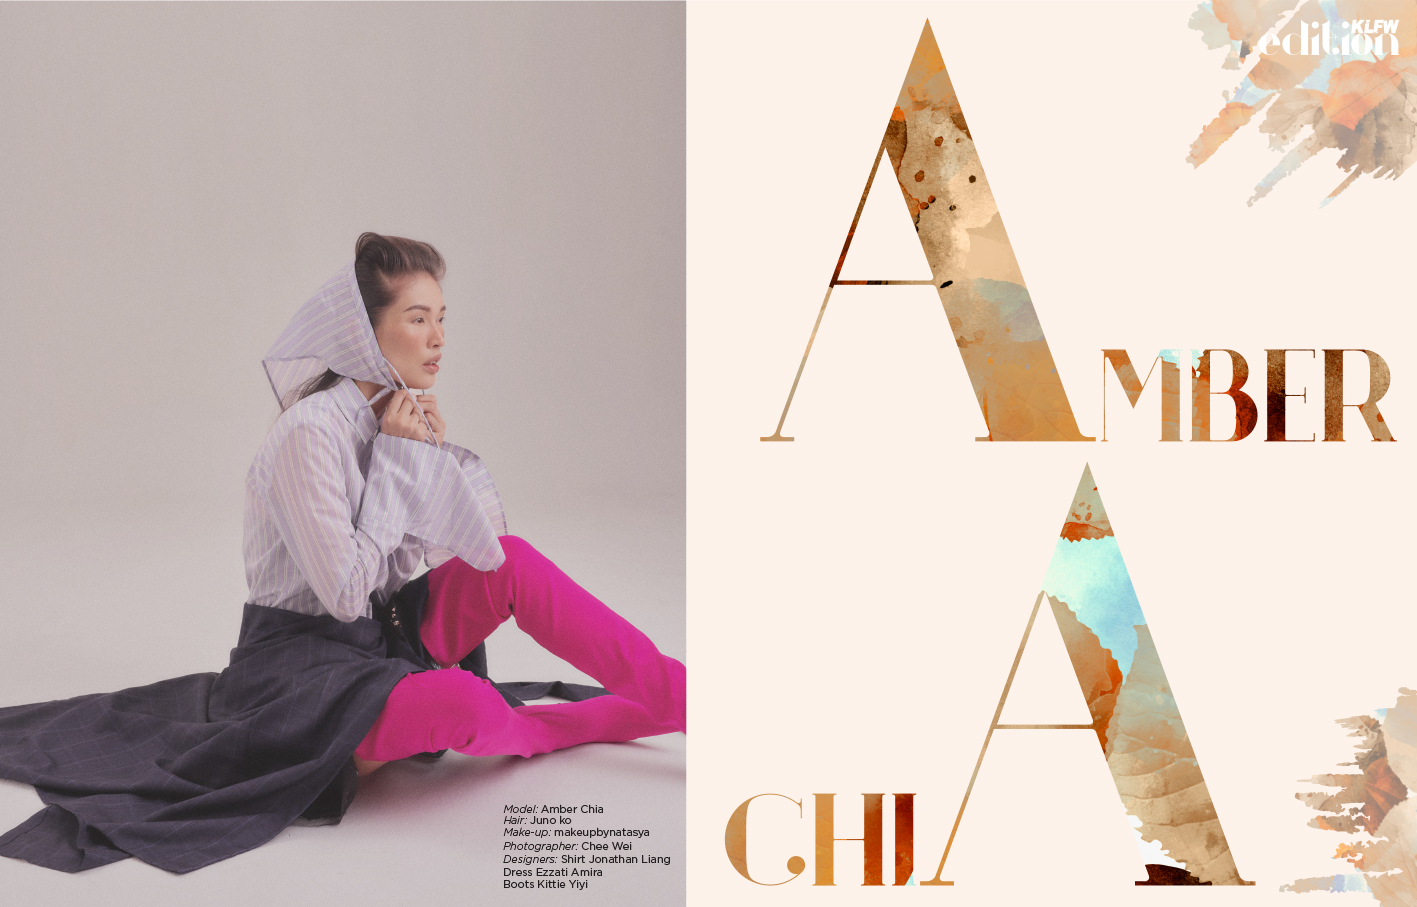 Model: Amber Chia Hair:  Juno ko , Make-up:  makeupbynatasya , Photographer:  Chee Wei , Designers: Shirt  Jonathan Liang  ,Dress  Ezzati Amira , Boots  Kittie Yiyi